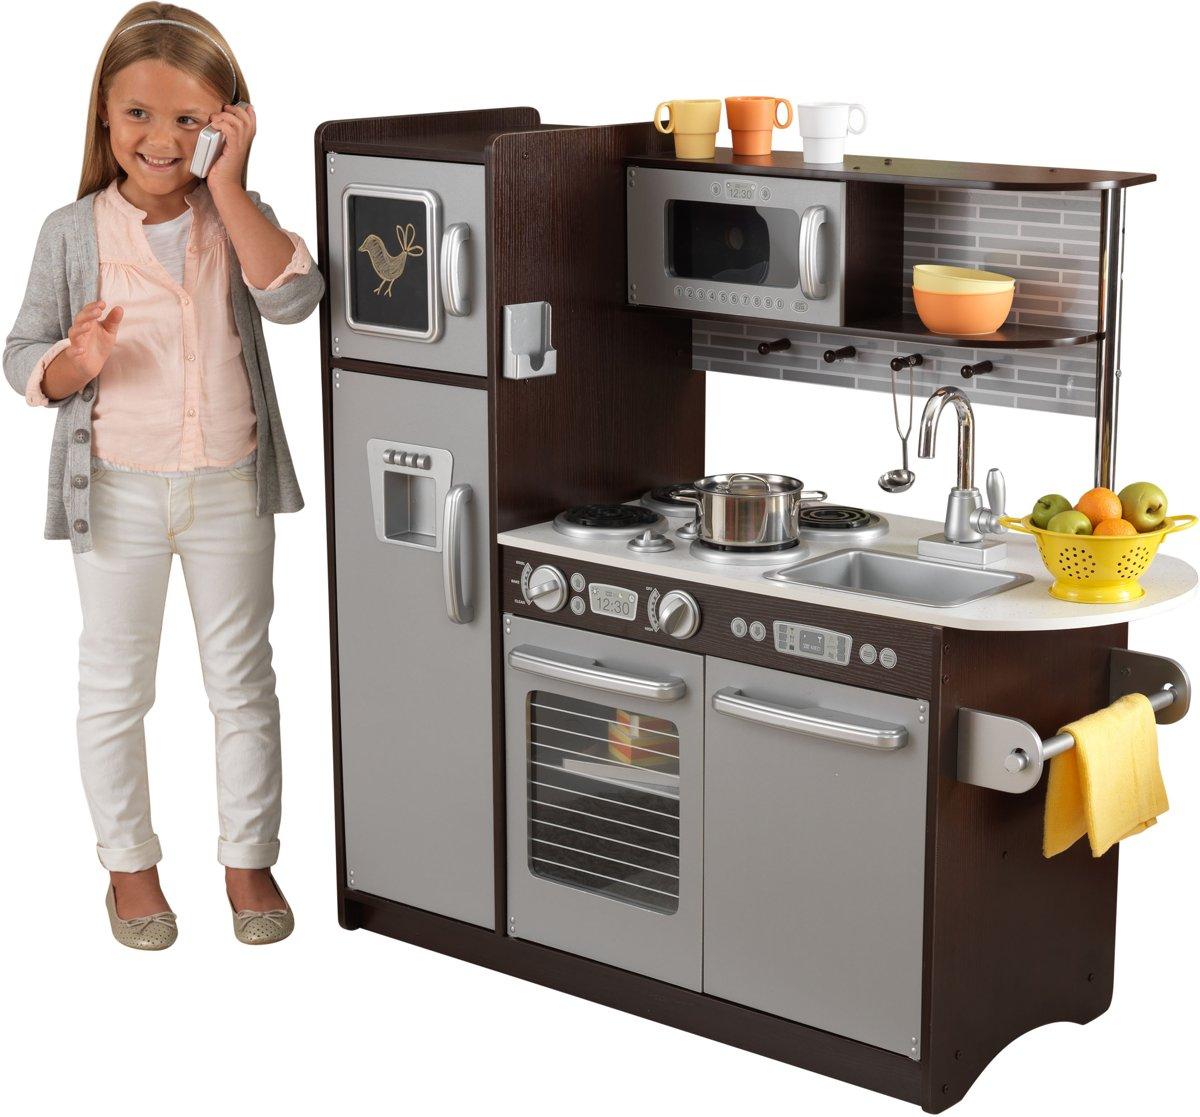 Kidkraft Keuken Grand Gourmet : kidkraft keuken 109 cm 3 14 jaar 219 00 ? 174 99 kidkraft uptown